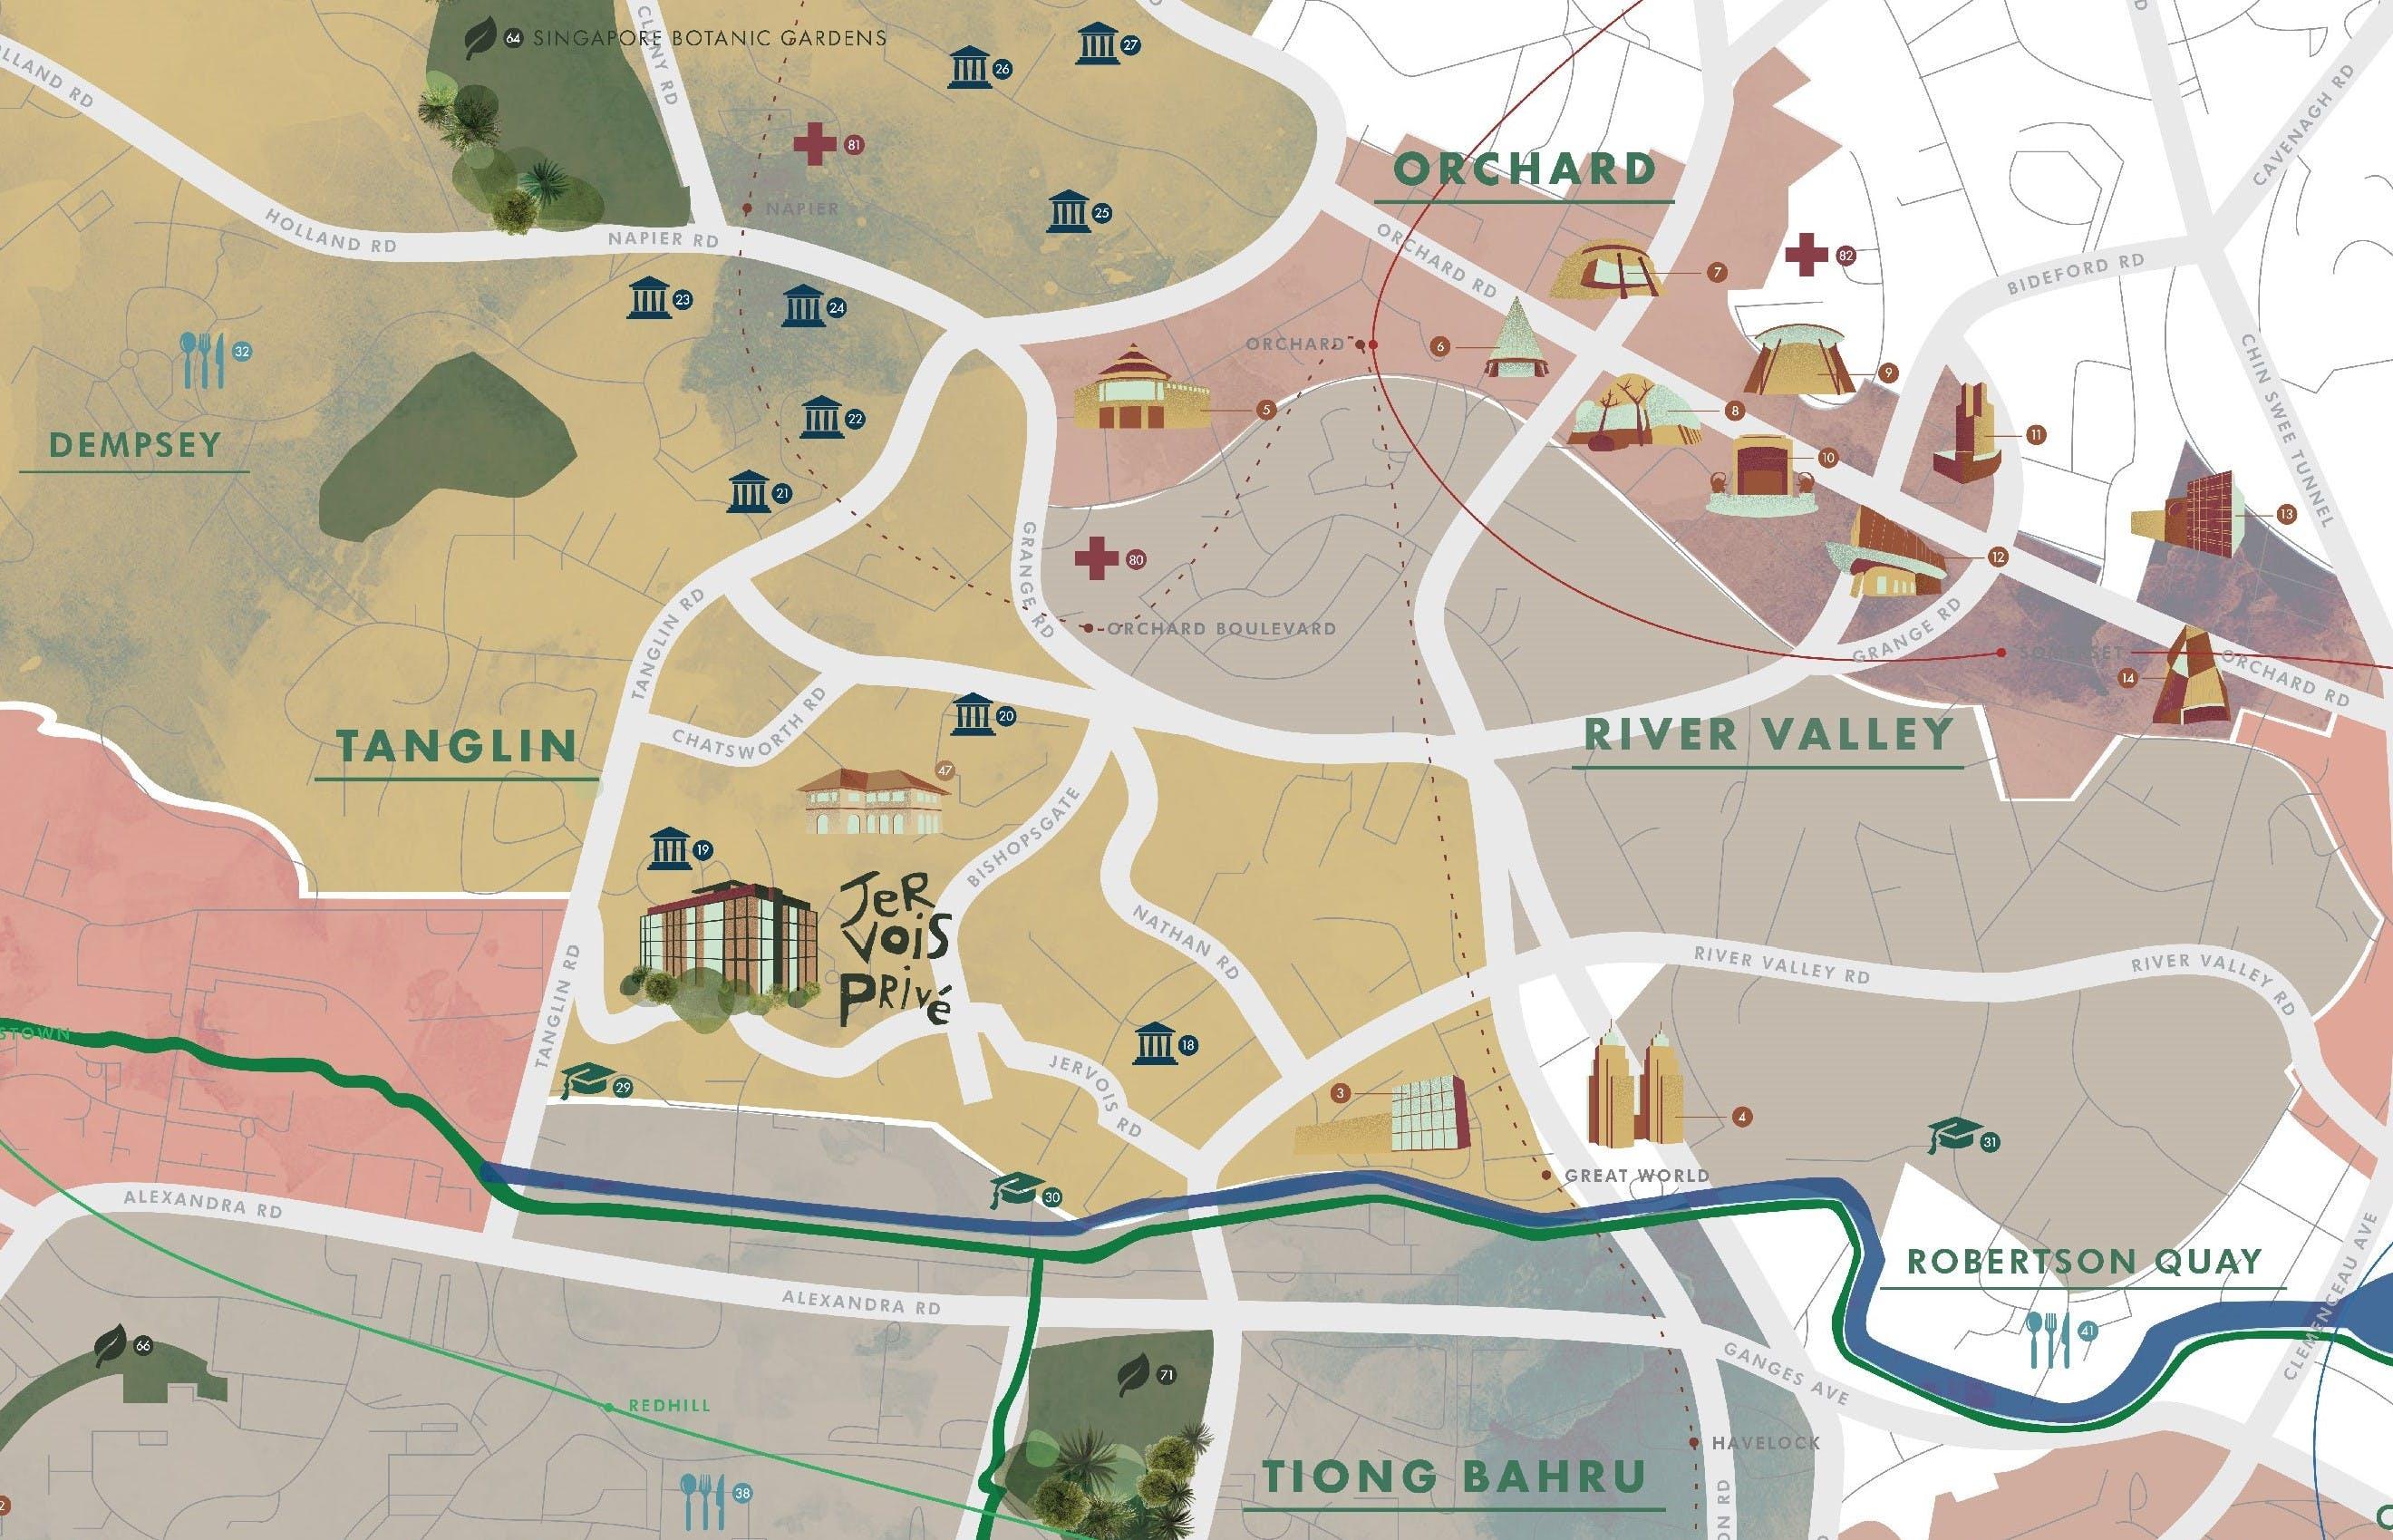 Jervois Prive Location Map